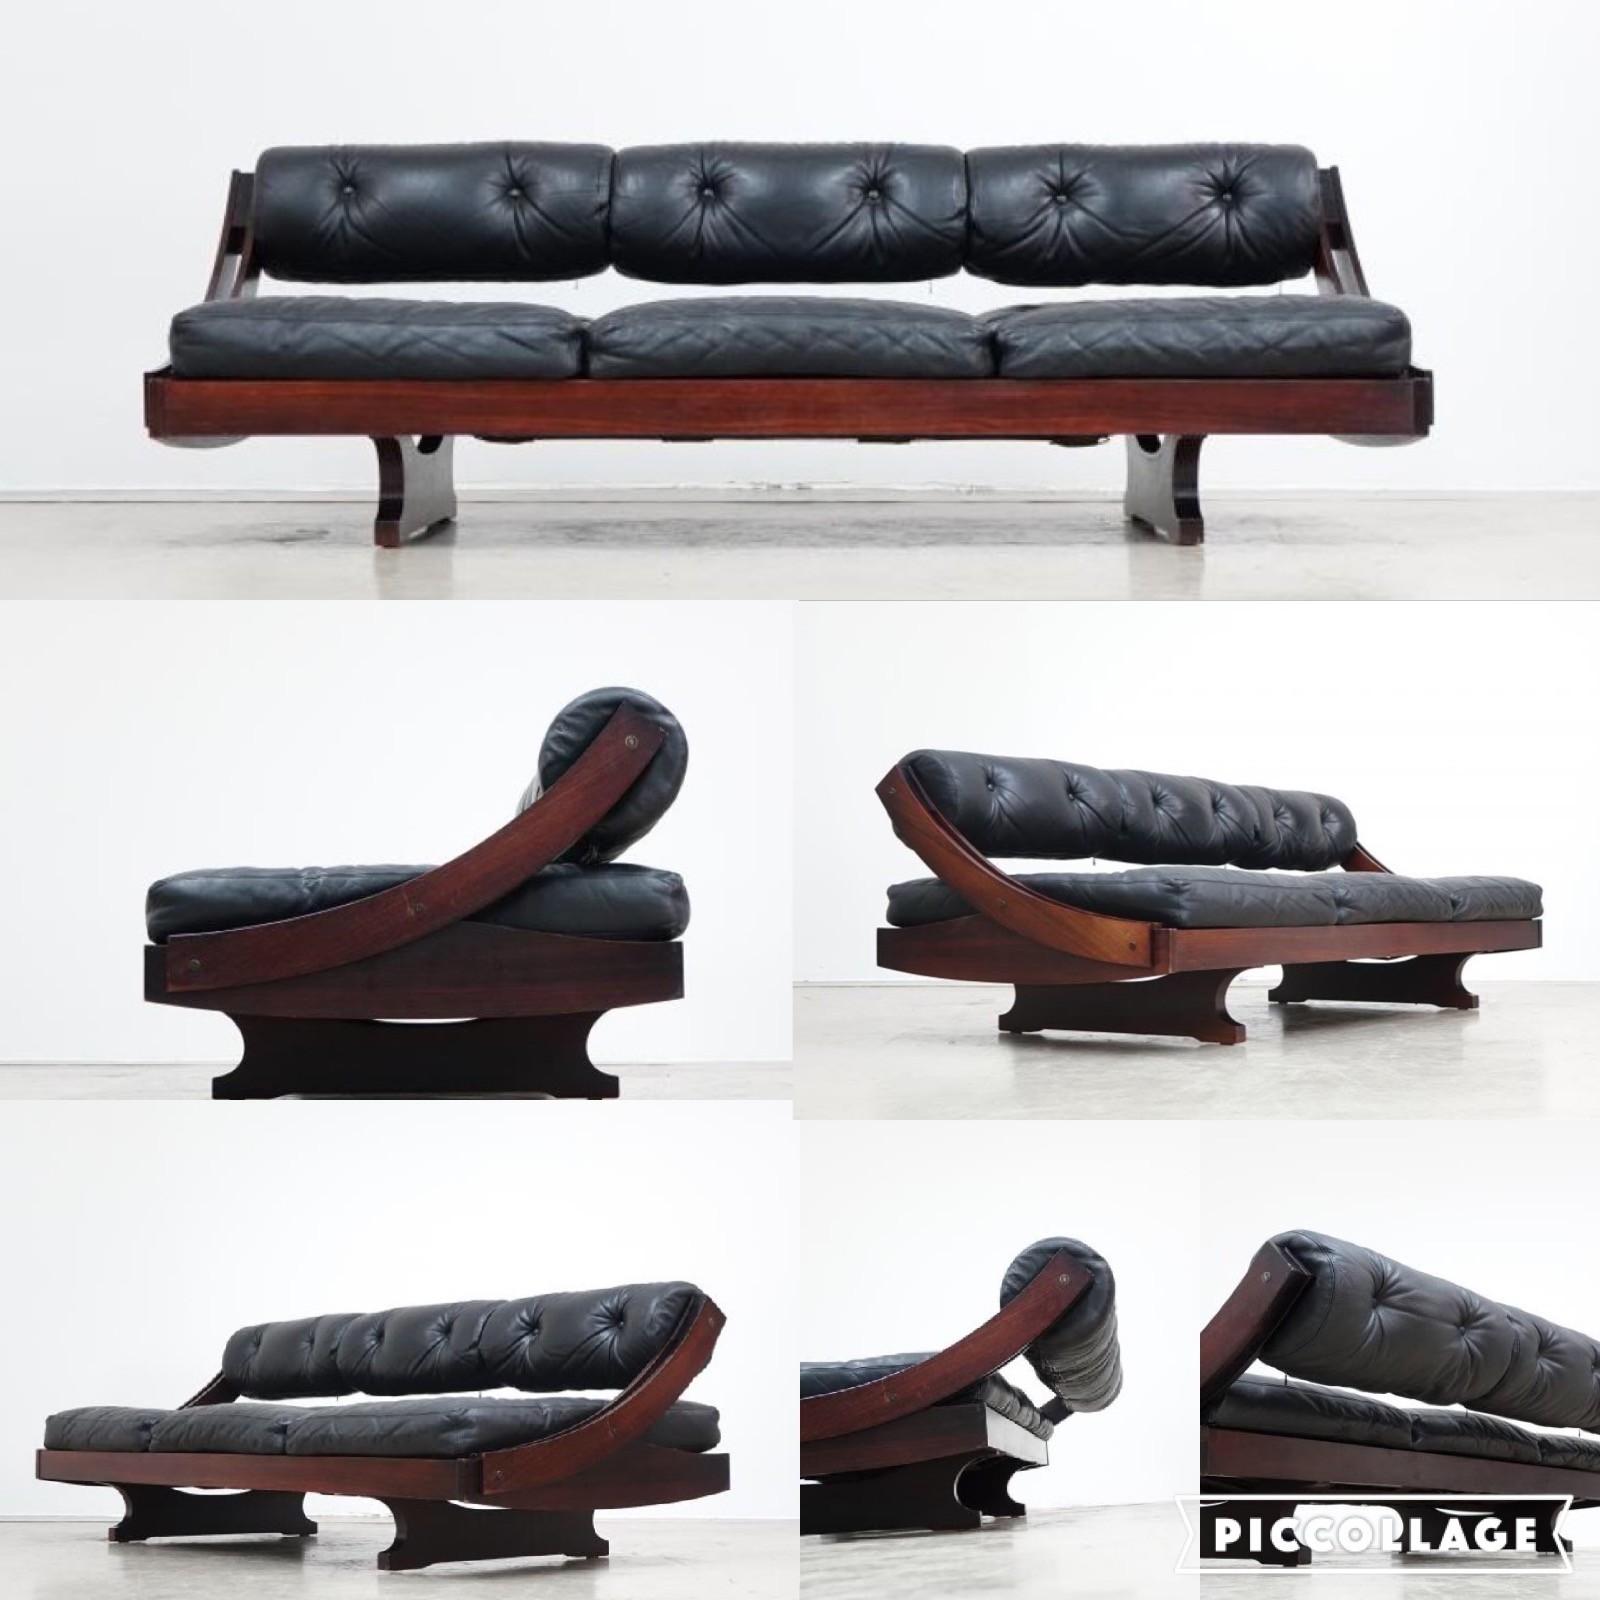 hay sofa mags leder old fashioned looking sofas lage sofa. cool loft en modulr for stua eller ...